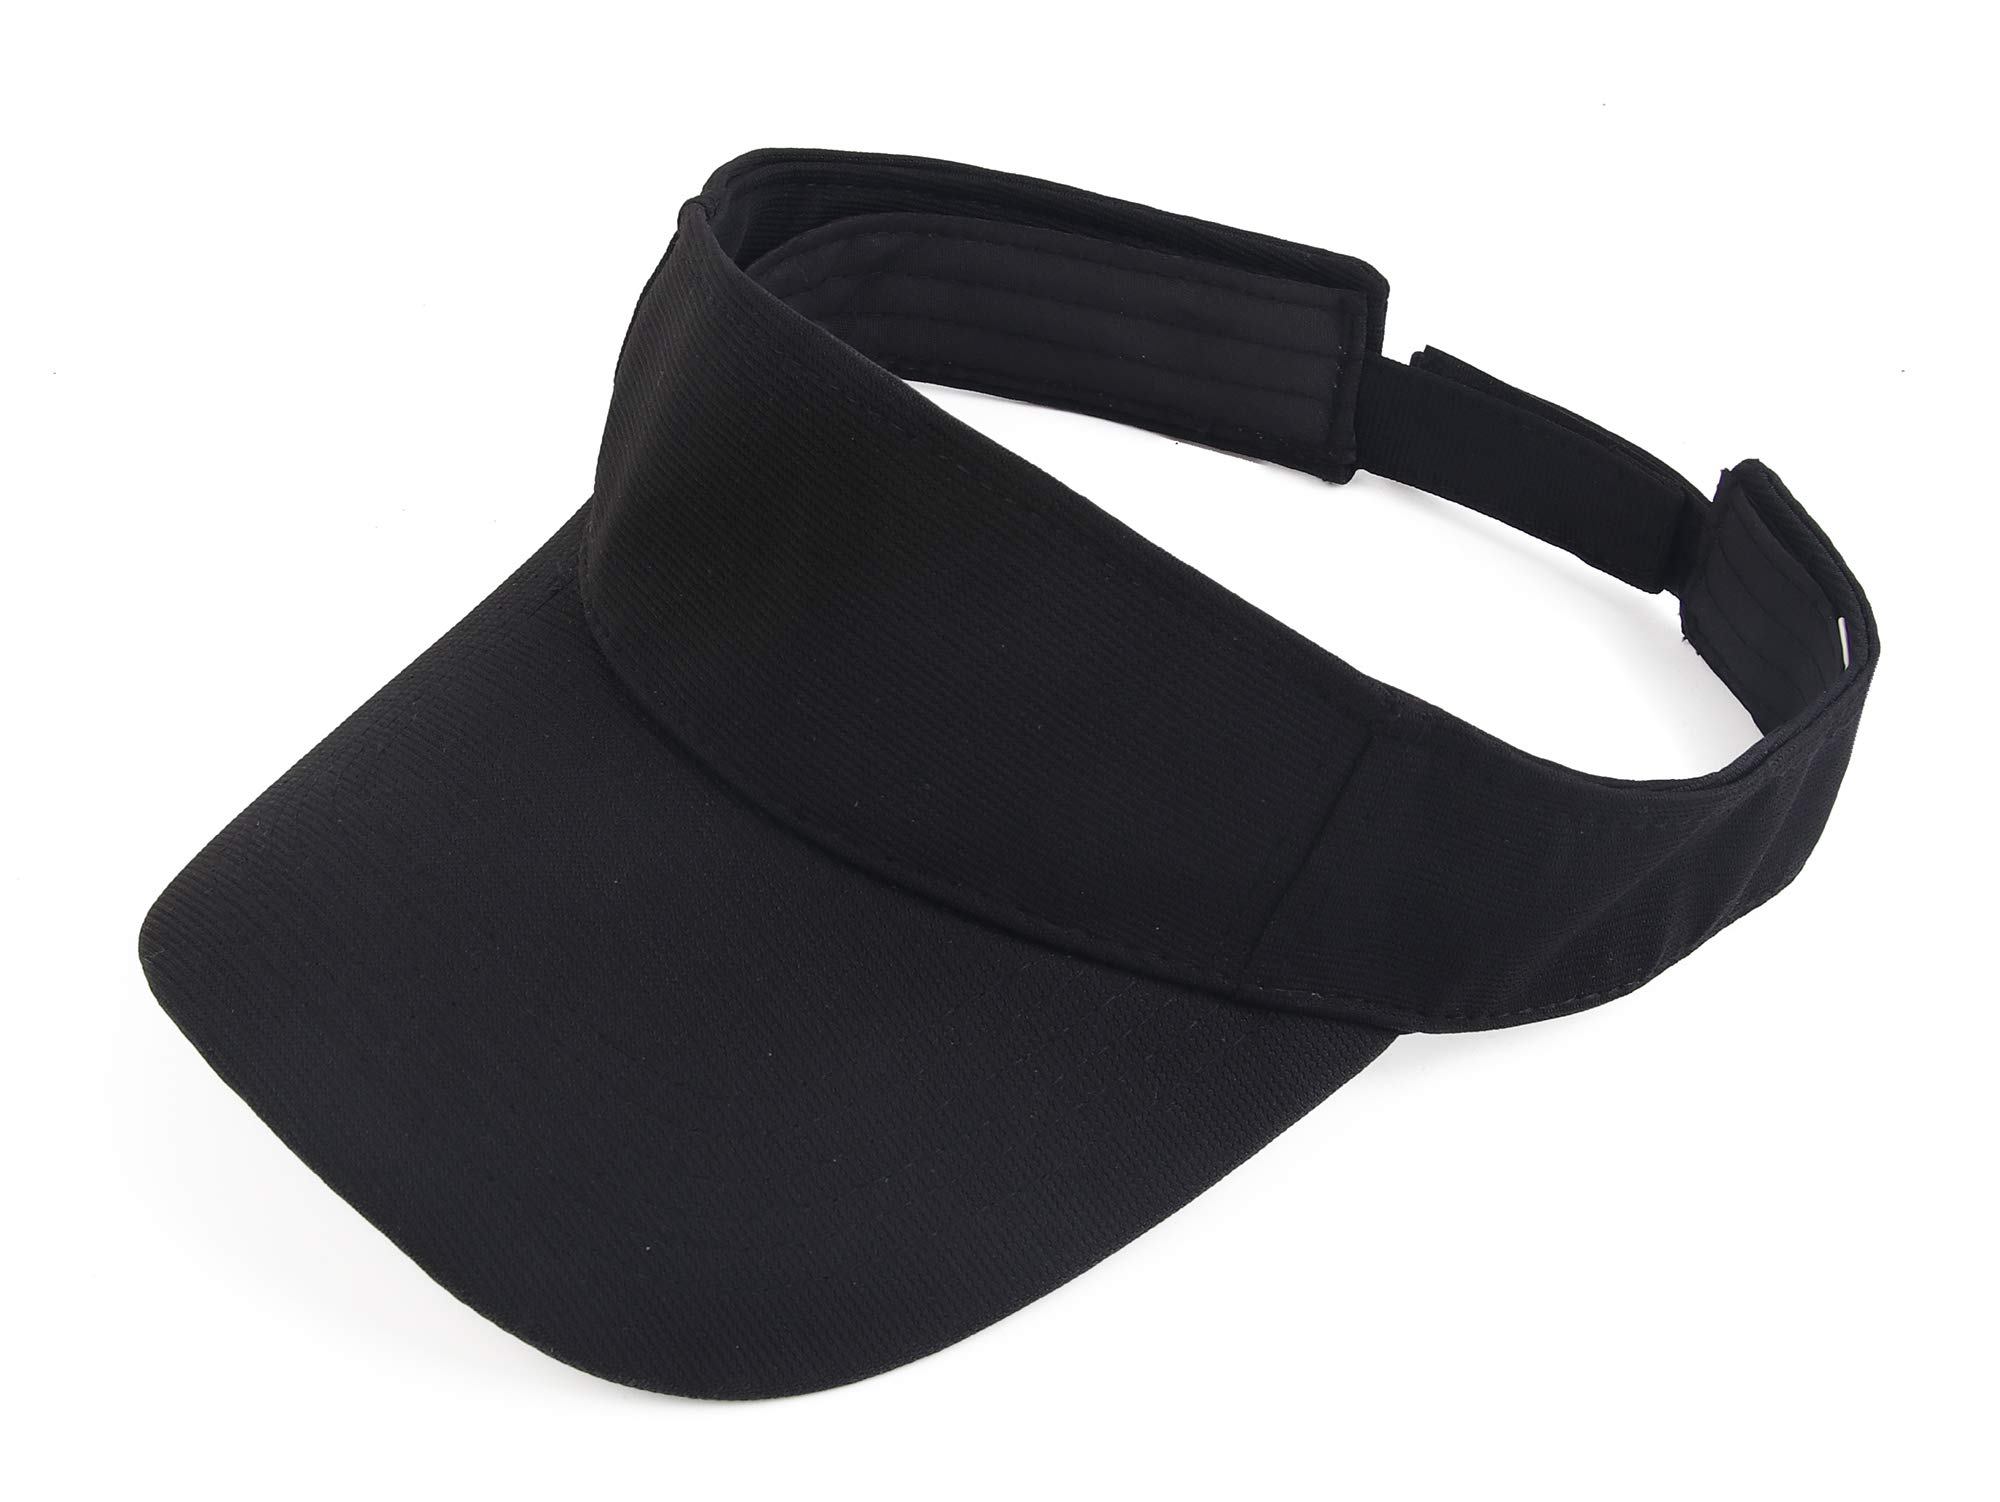 Melesh Plain Men Women Sport Headband Sun Visor Adjustable Athletic Sportswear Runing Outdoor Hat Cap